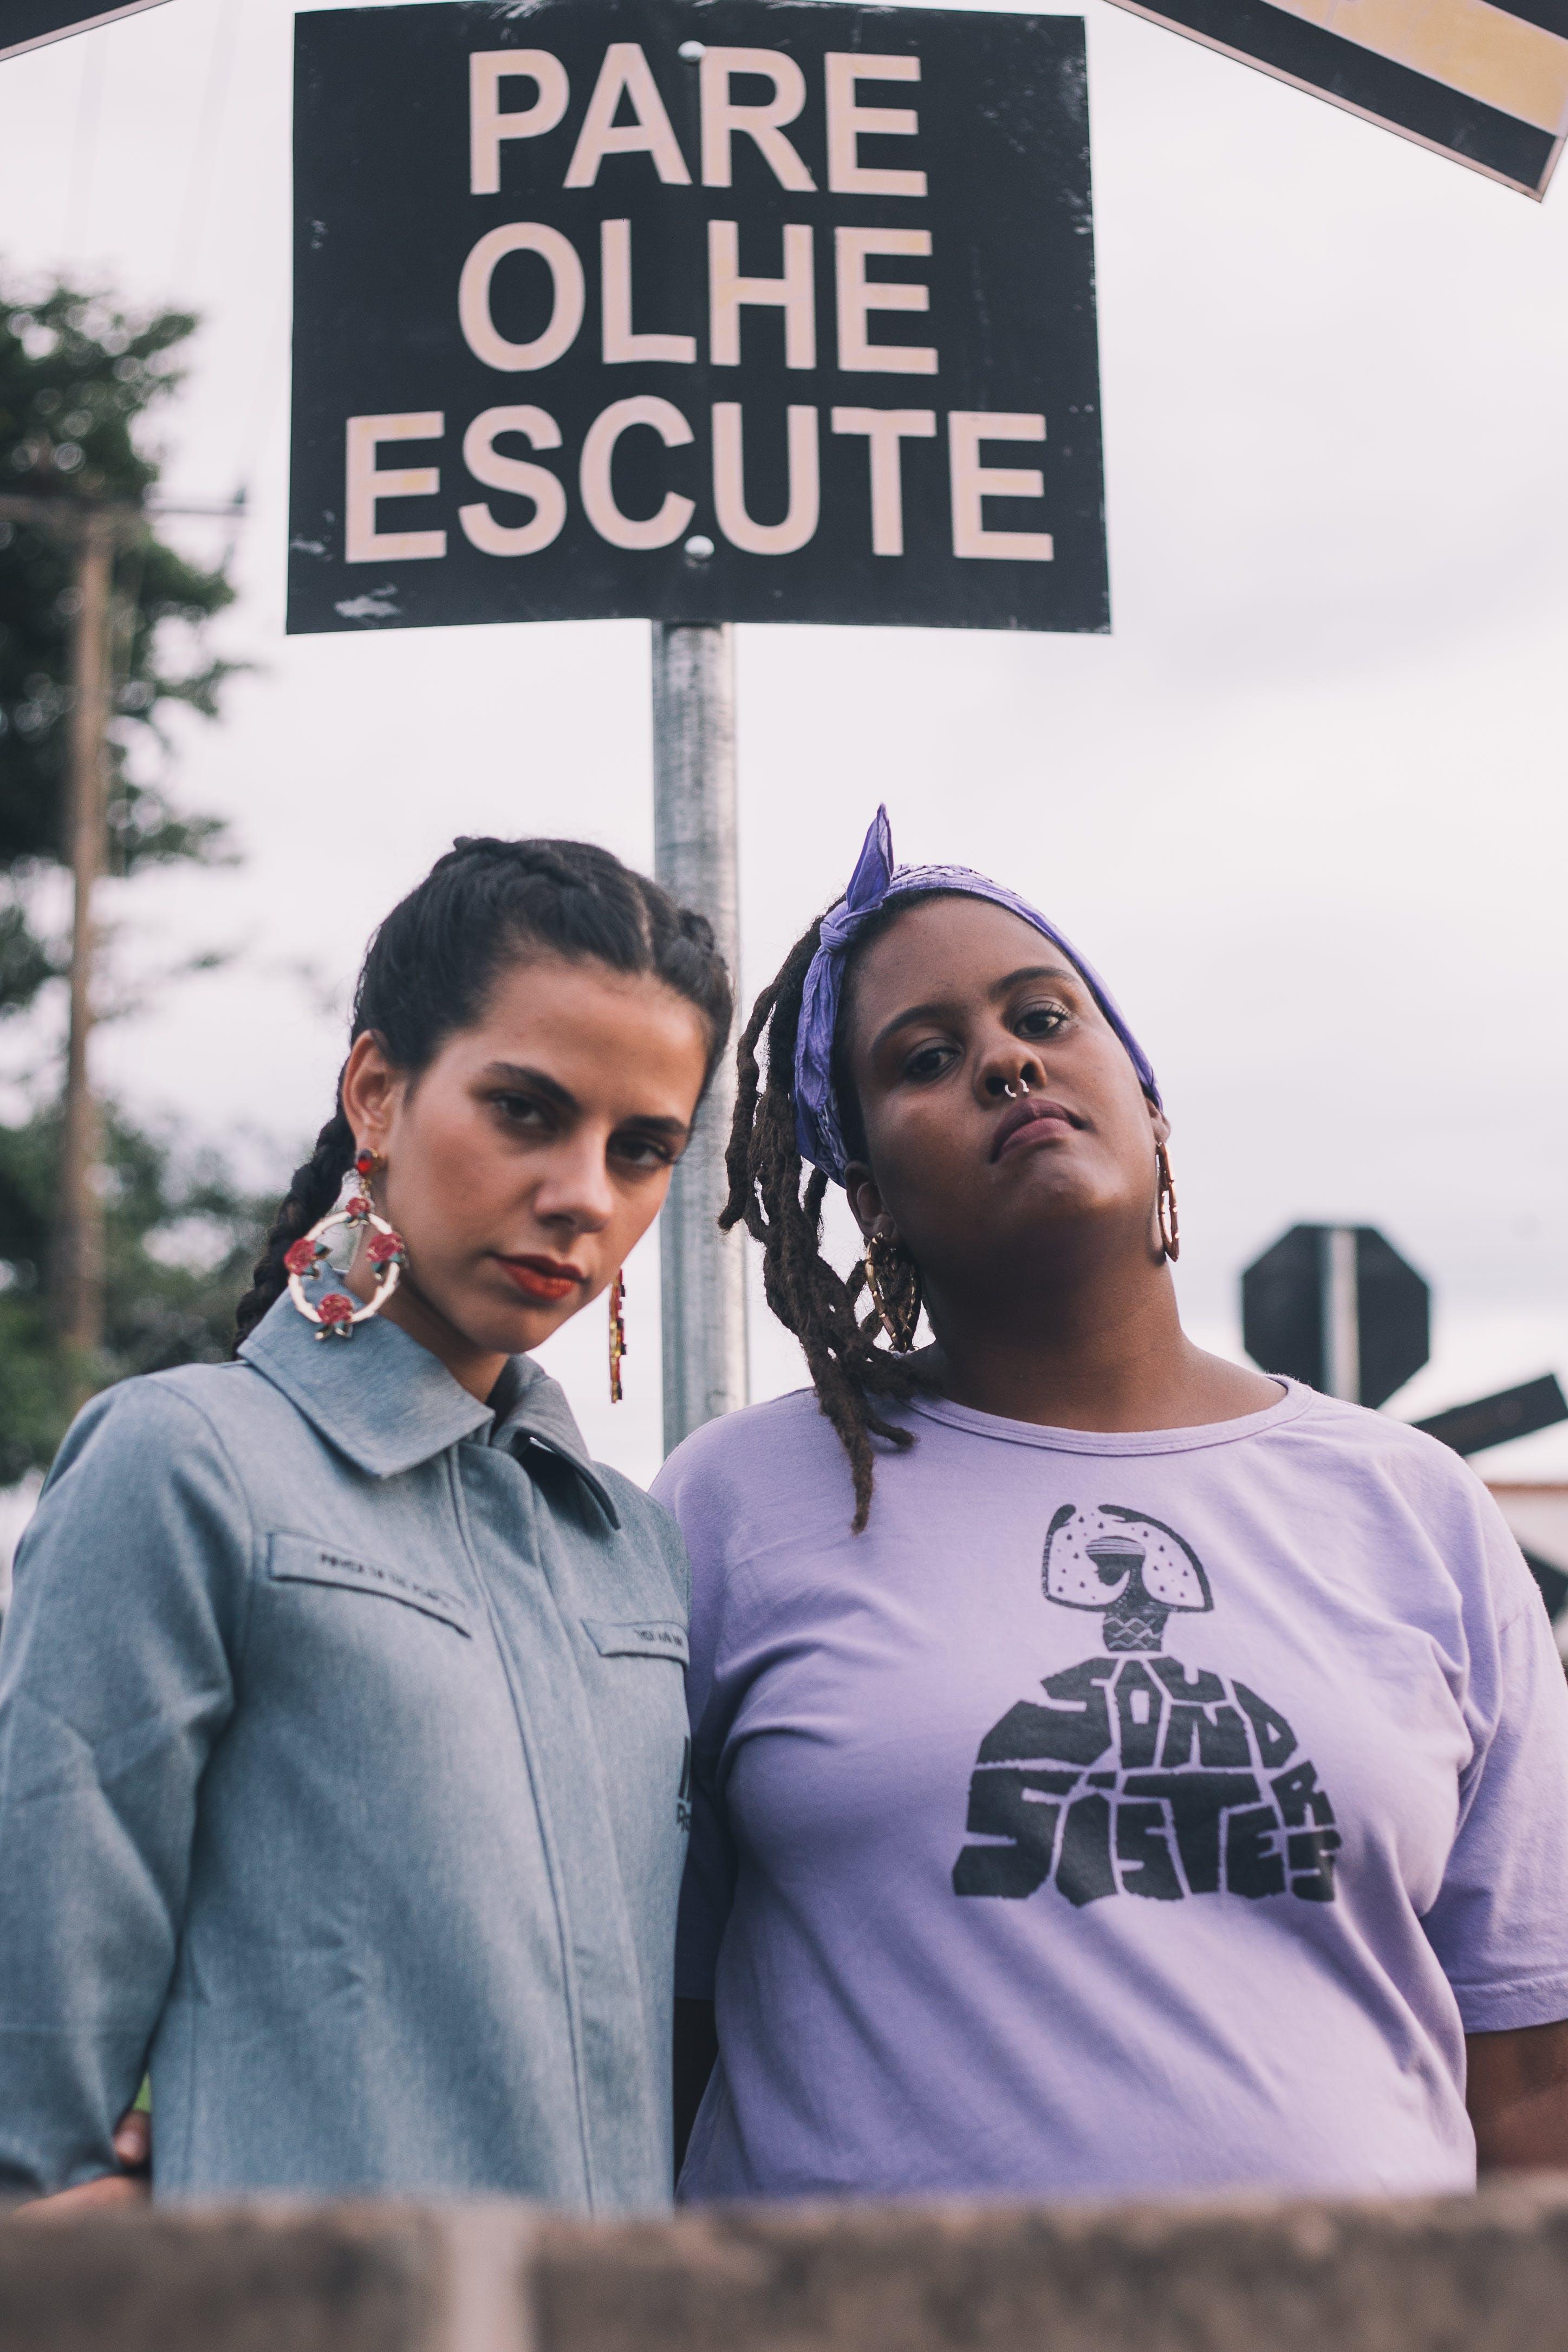 Woman Wearing Purple Scoop-neck Top Beside Woman Wearing Blue Denim Collared Top